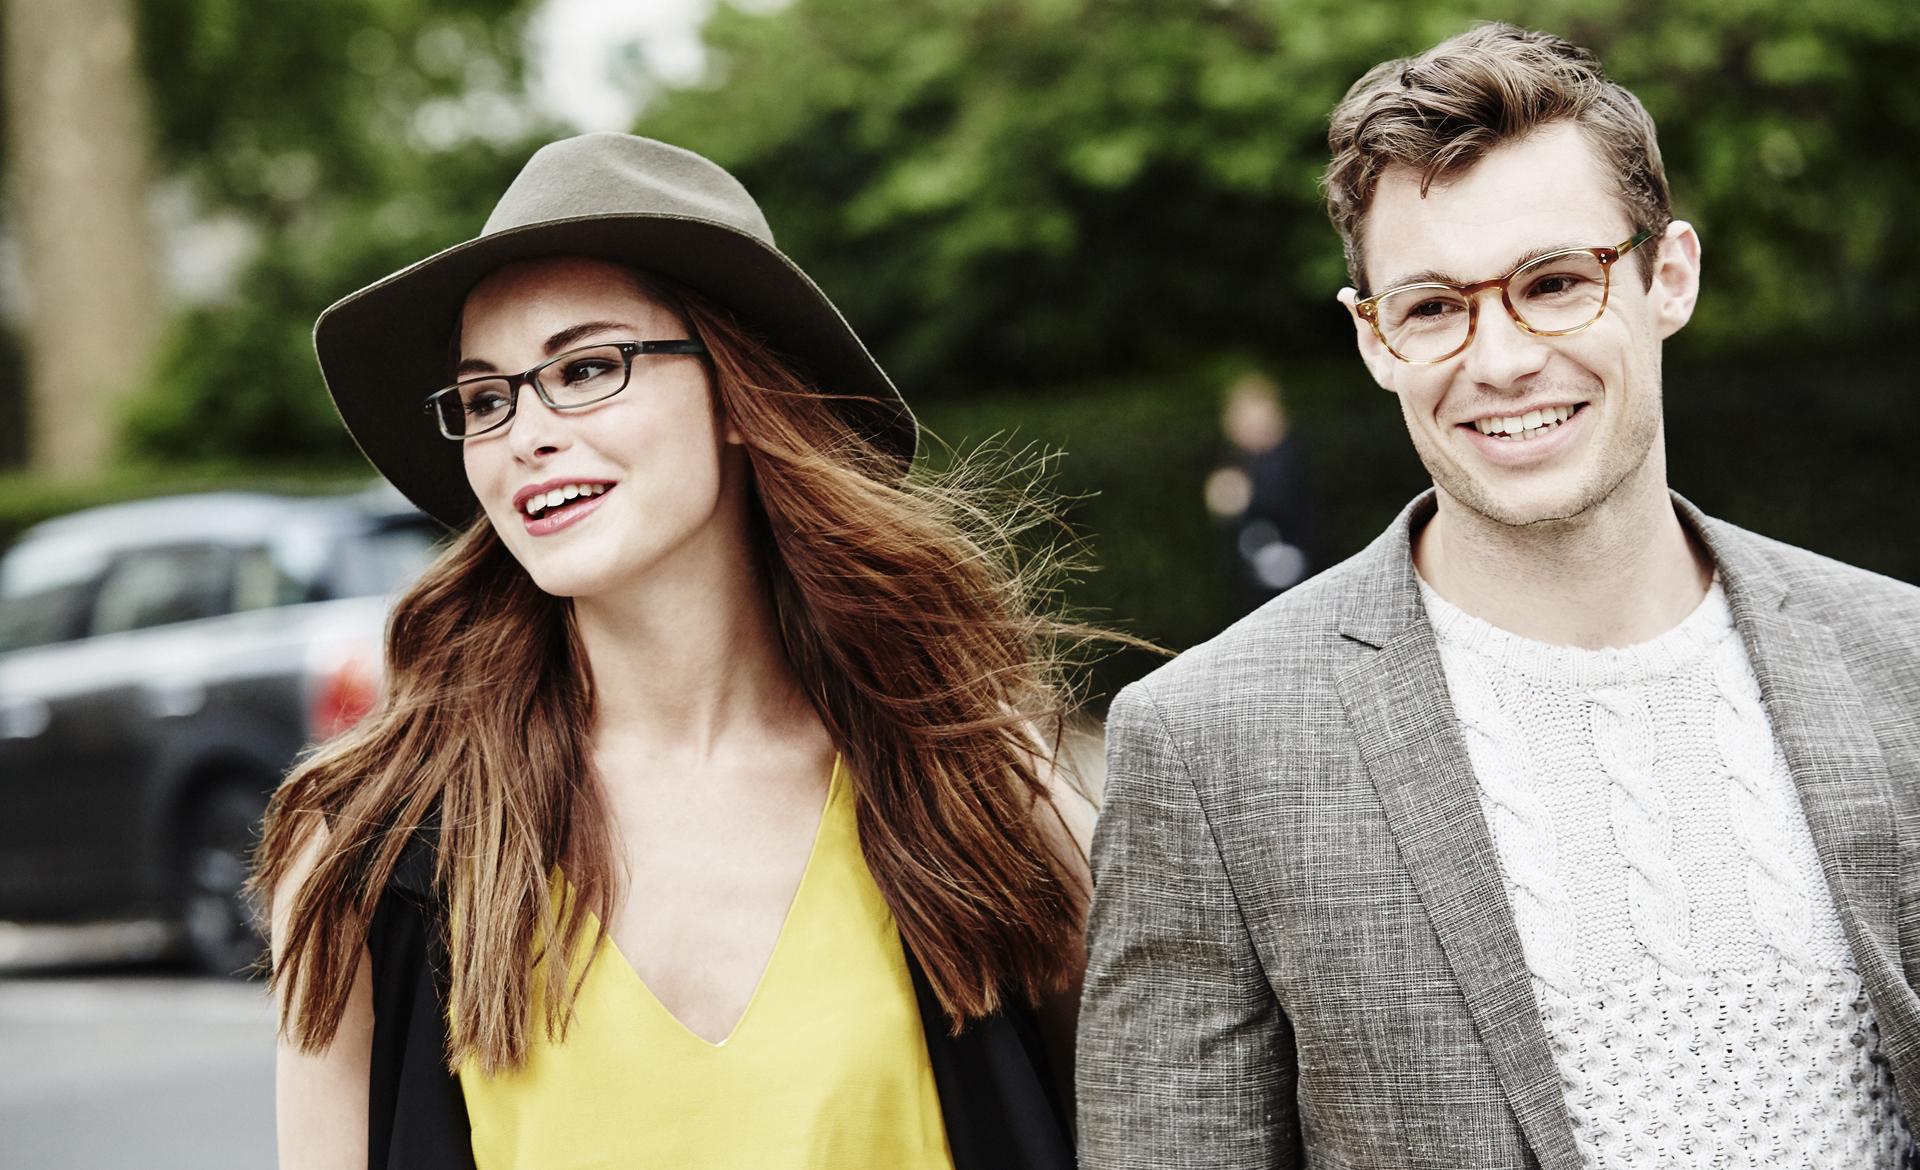 Walter and Herbert Eyewear Campaign